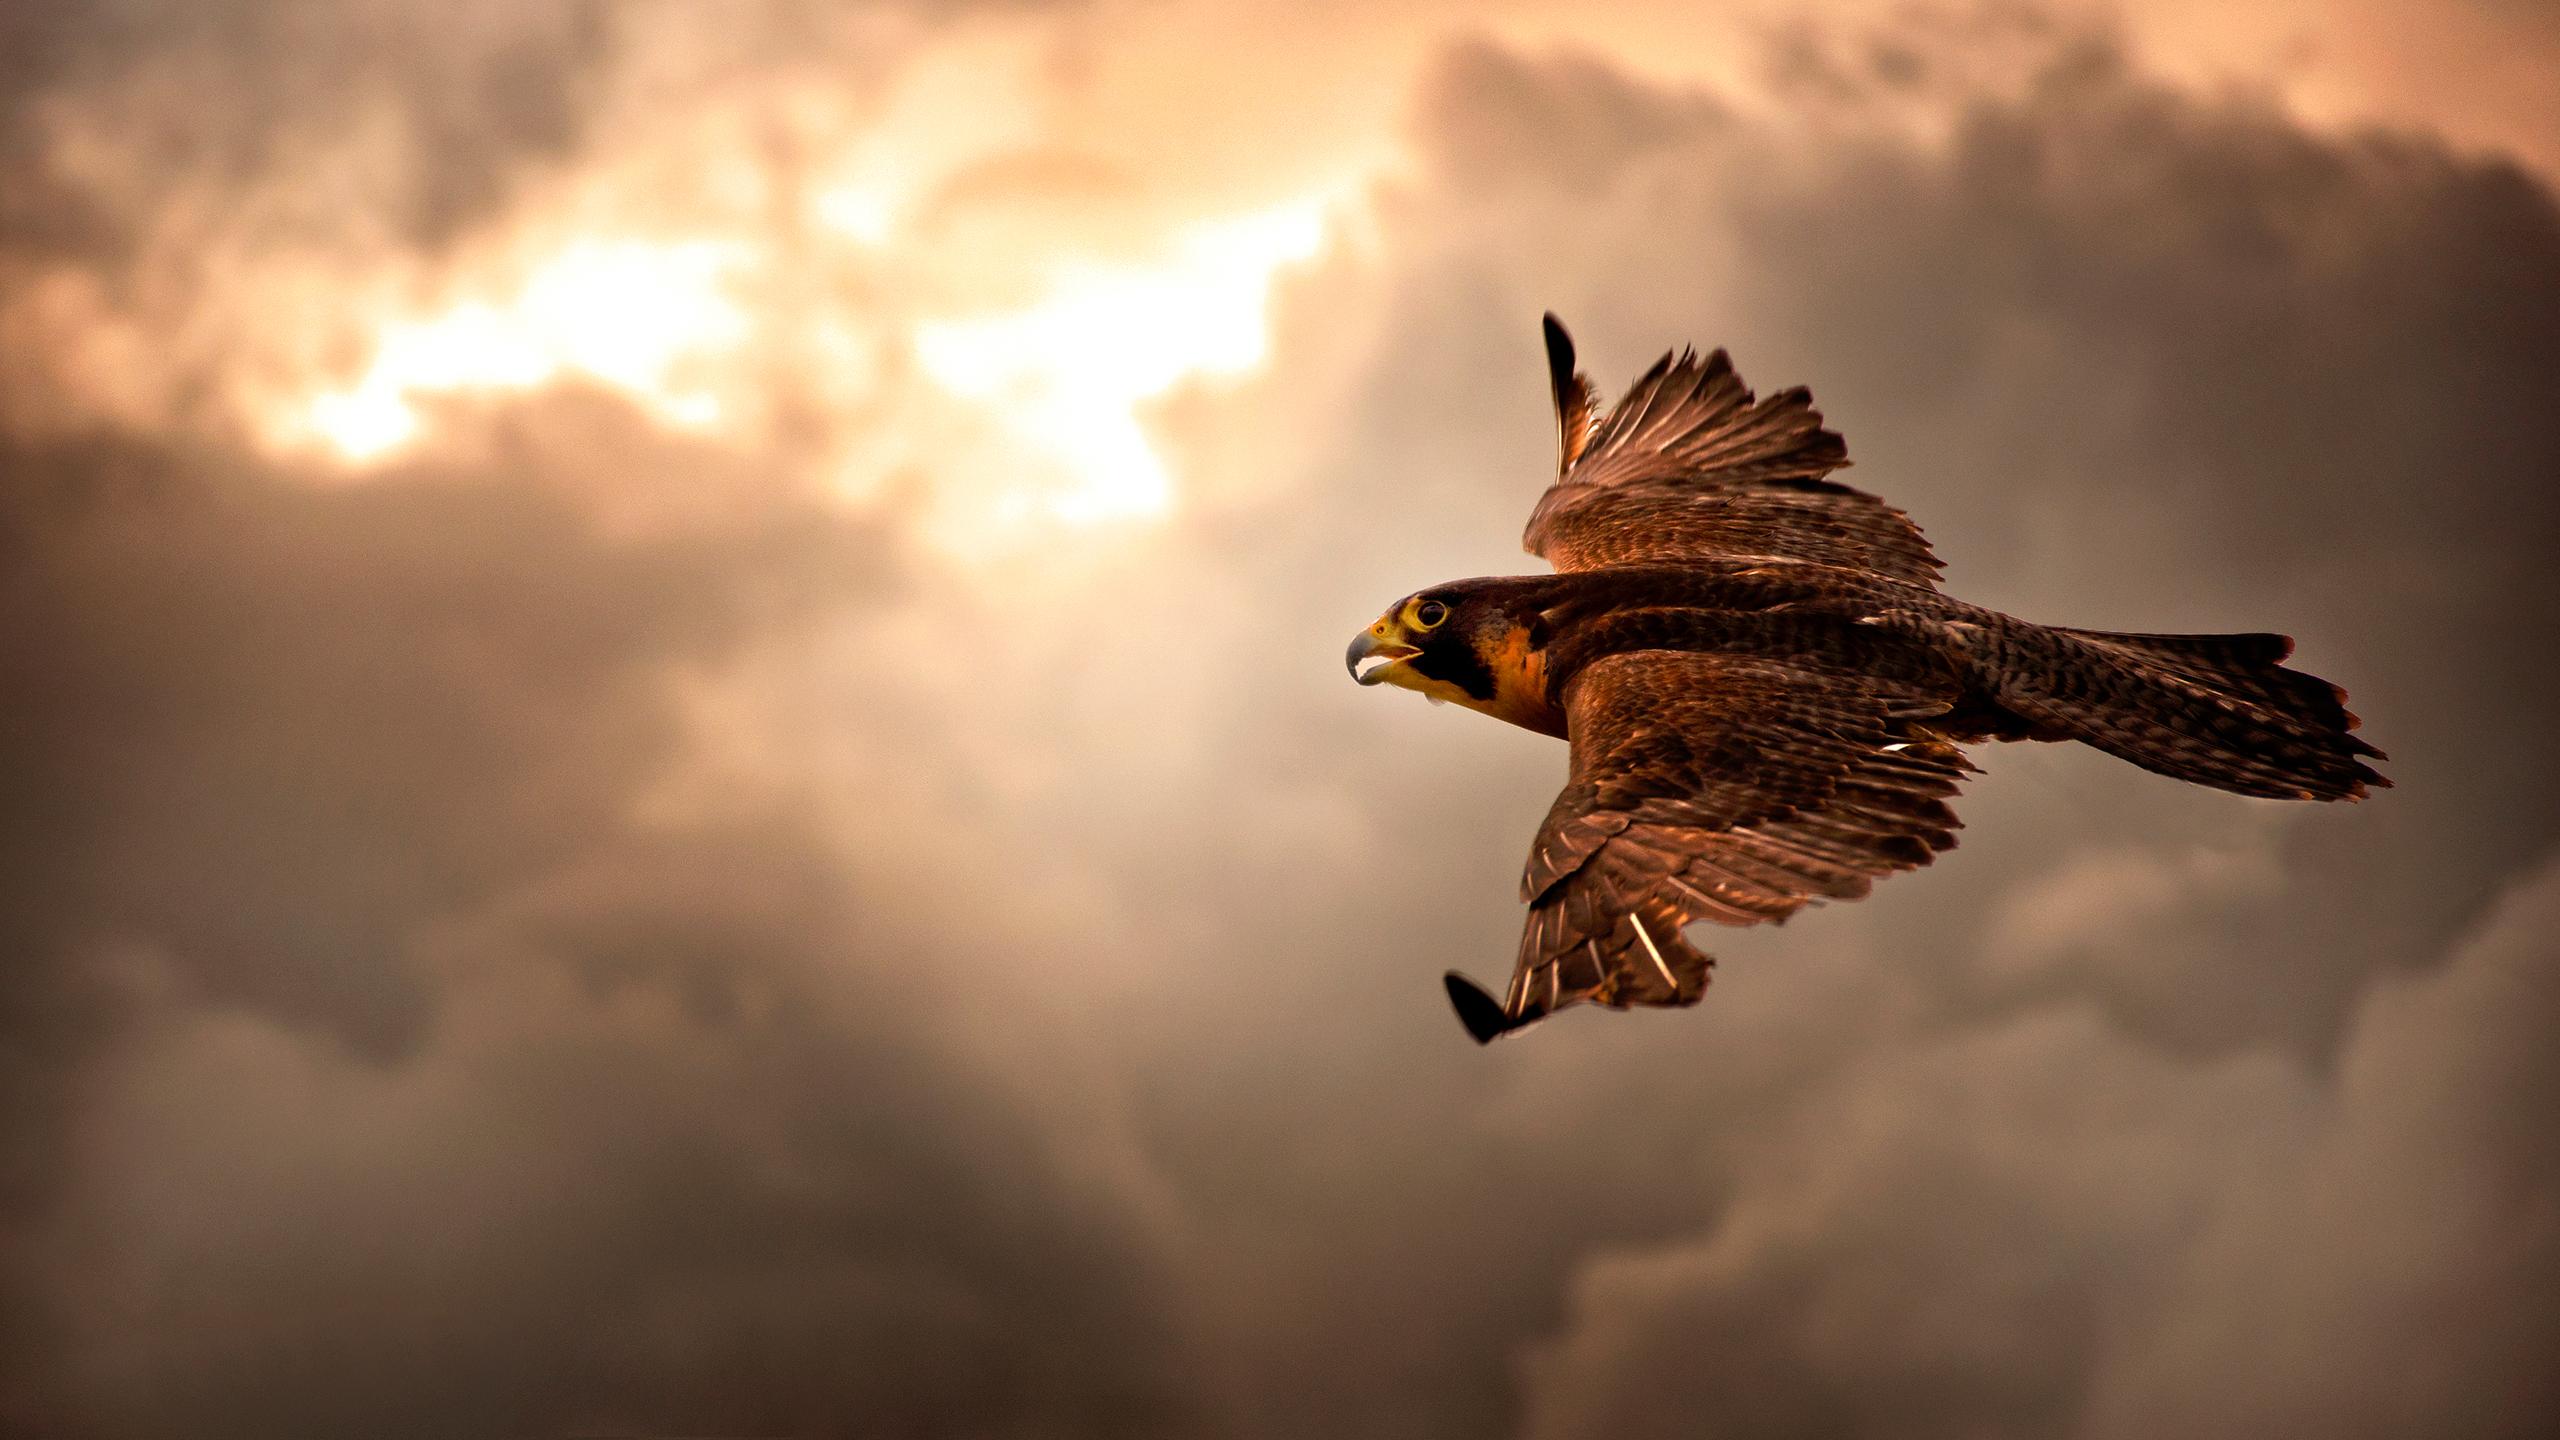 falcon_flight_2560x1440